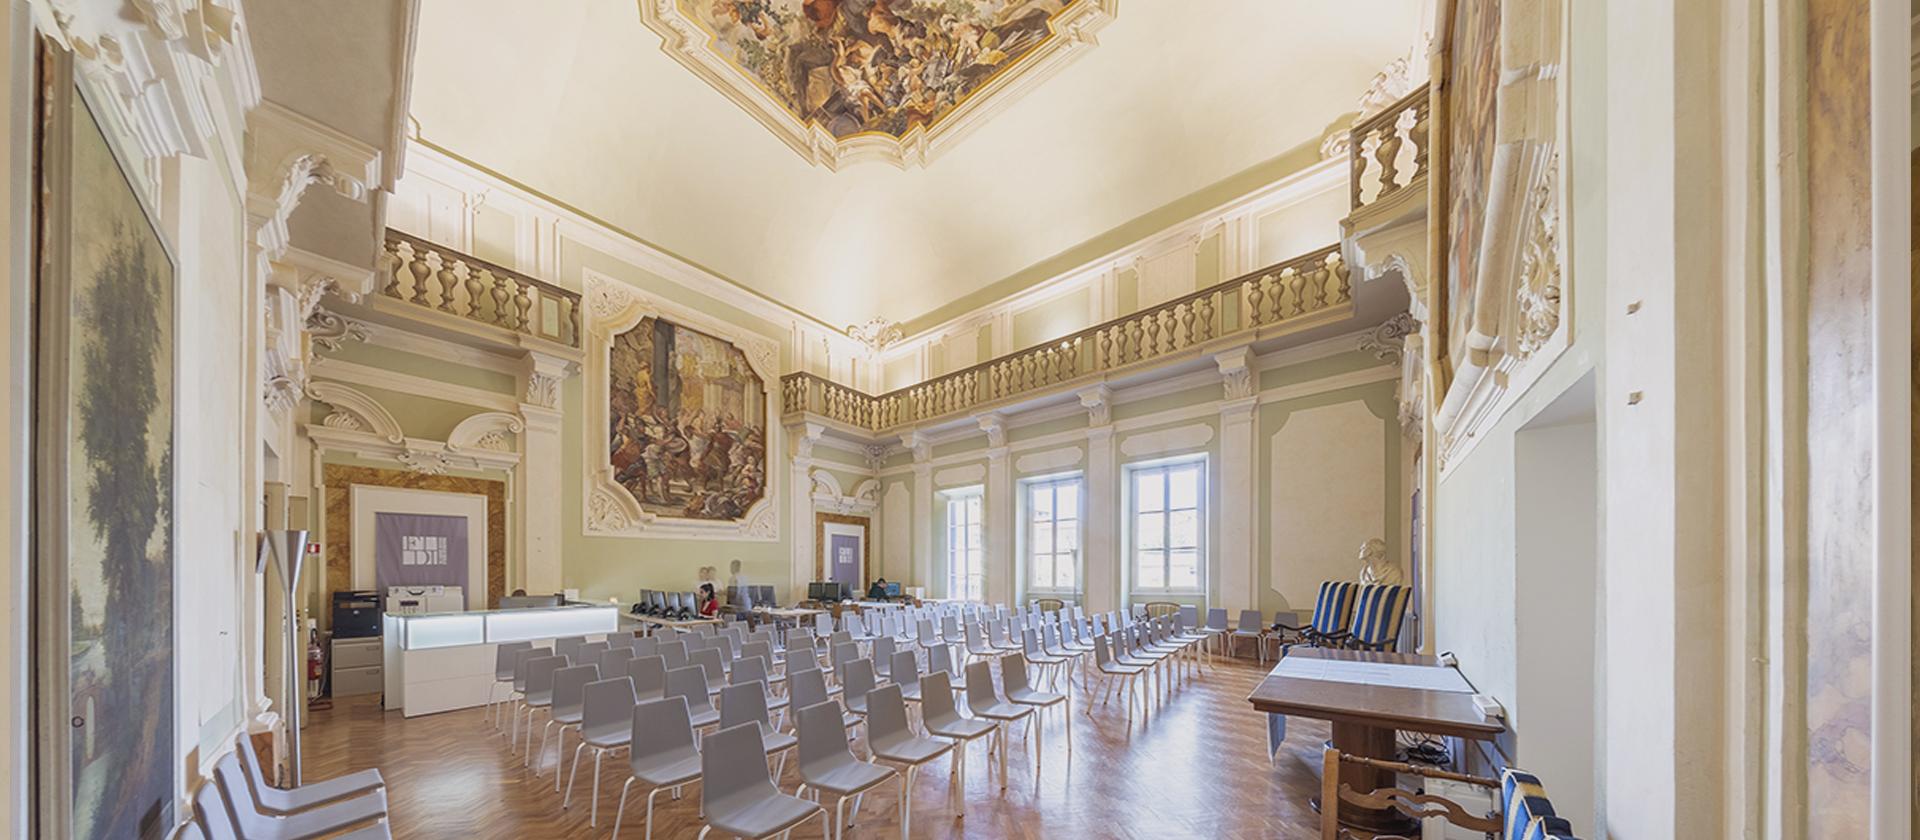 fidi design school in italy masters courses florence institute